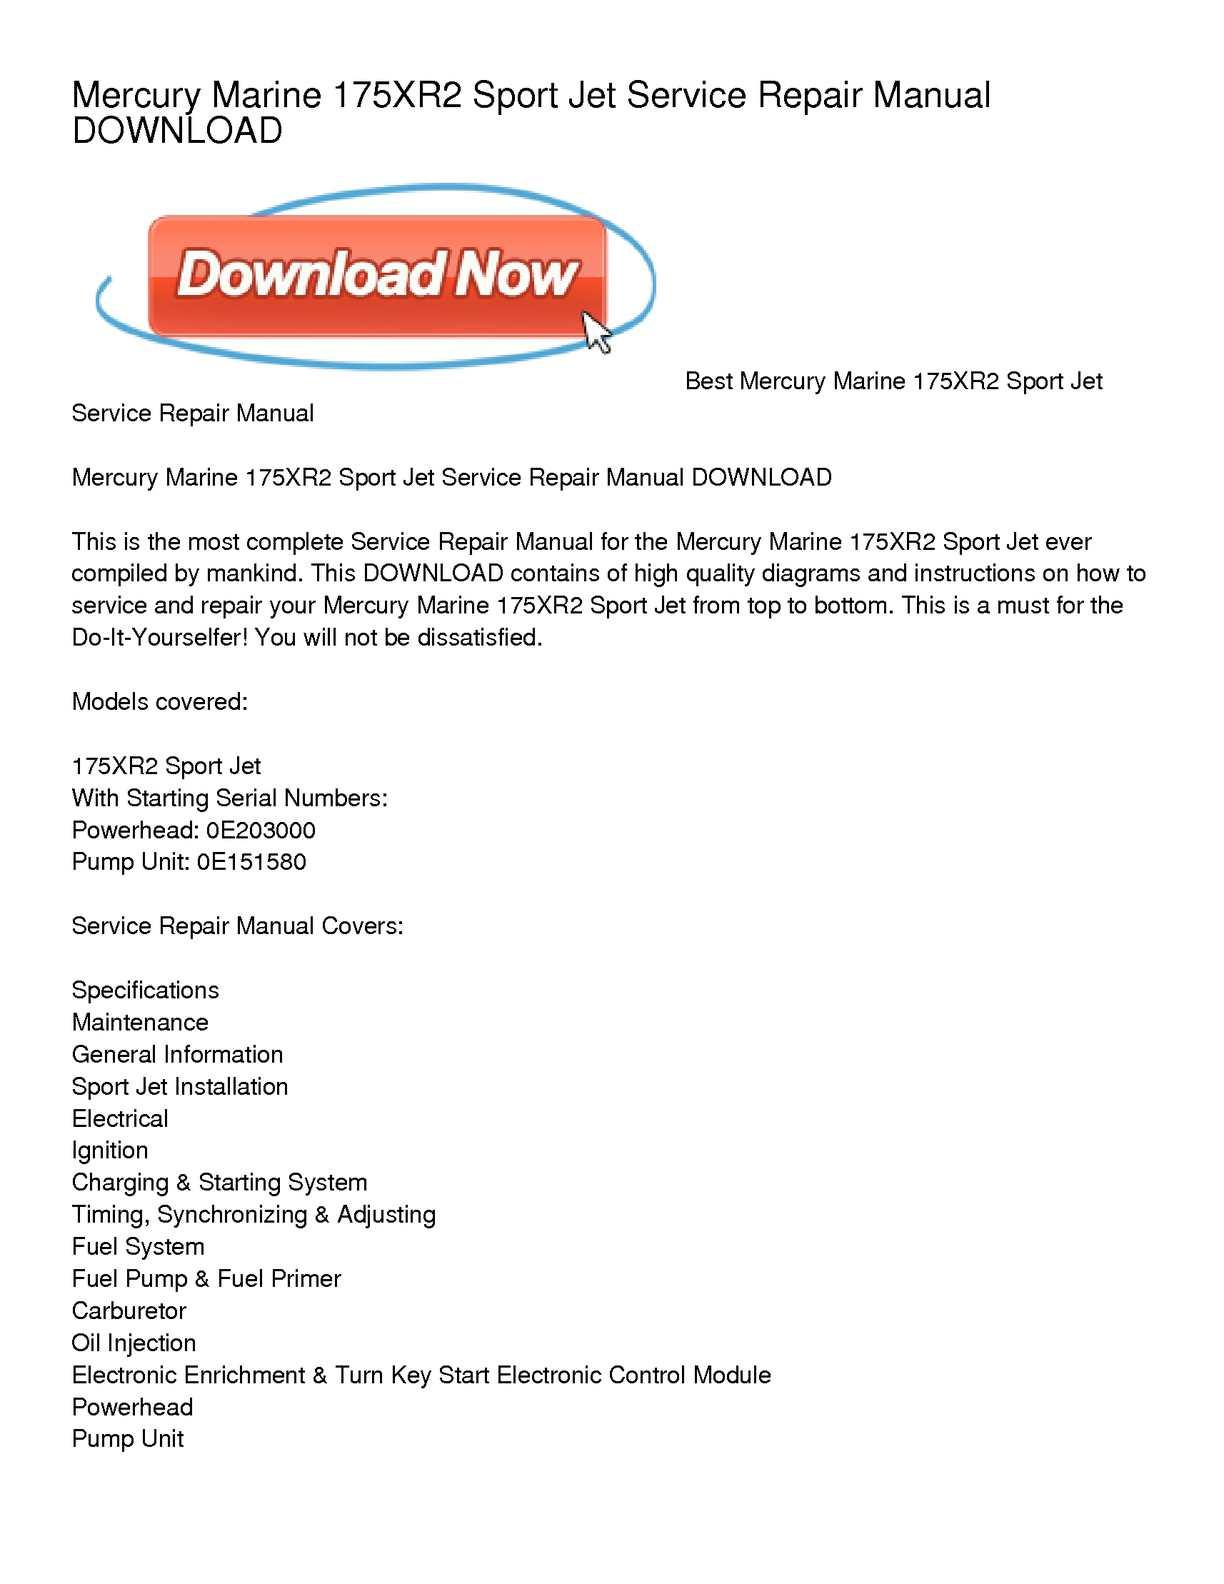 calam o mercury marine 175xr2 sport jet service repair manual download rh calameo com mercury sport jet 90 manual download mercury 175 sport jet manual